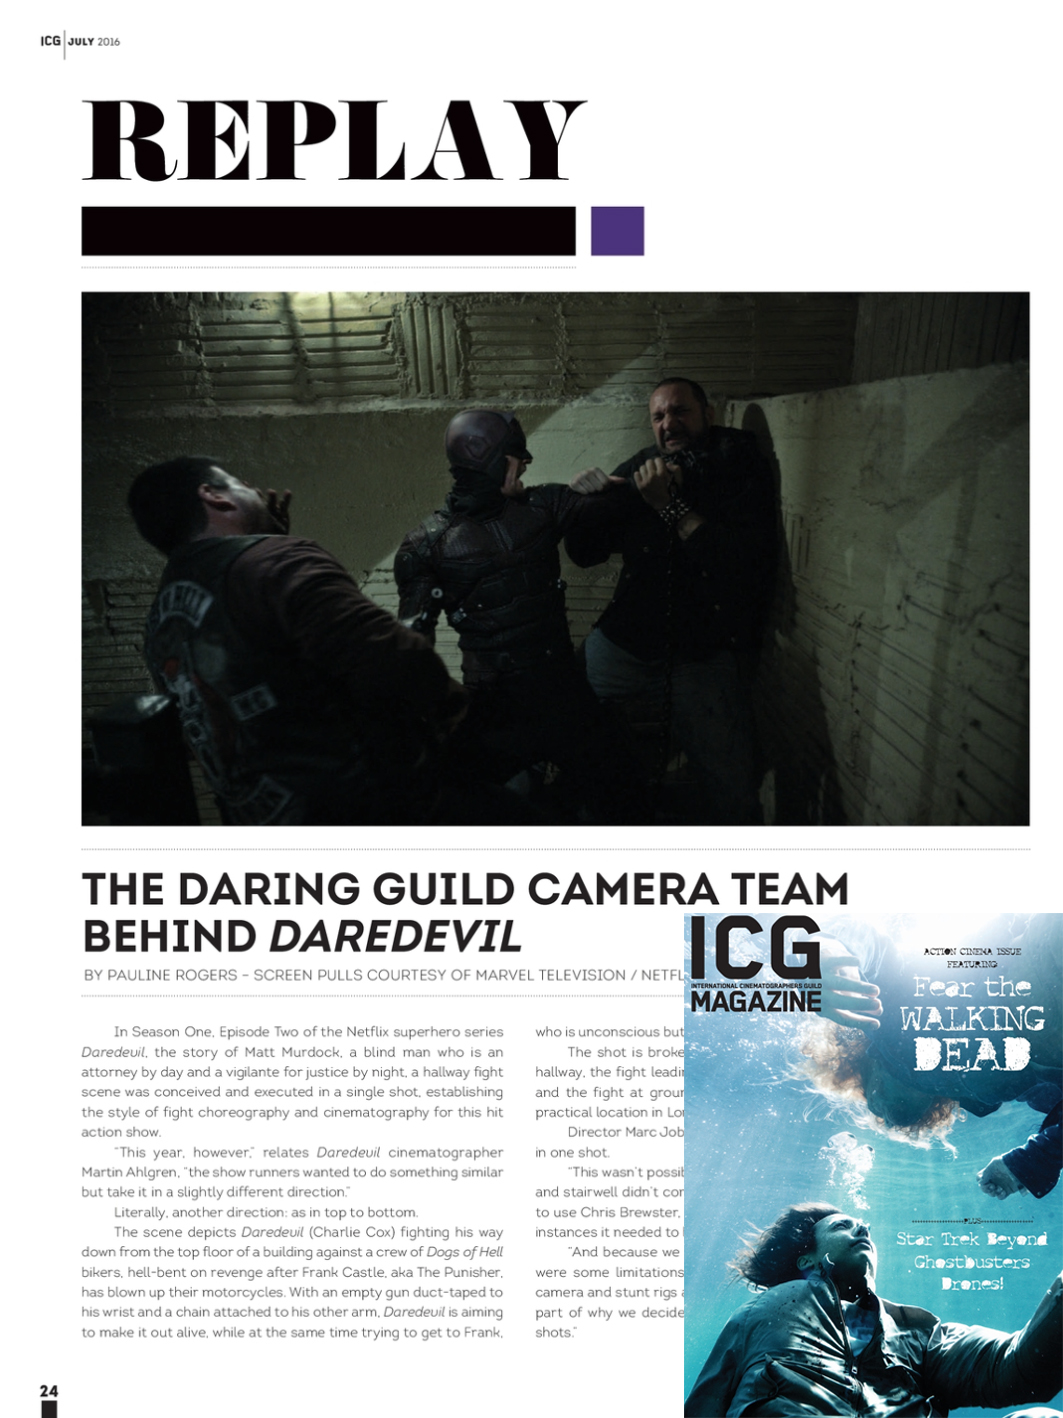 ICG Magazine - July 2016